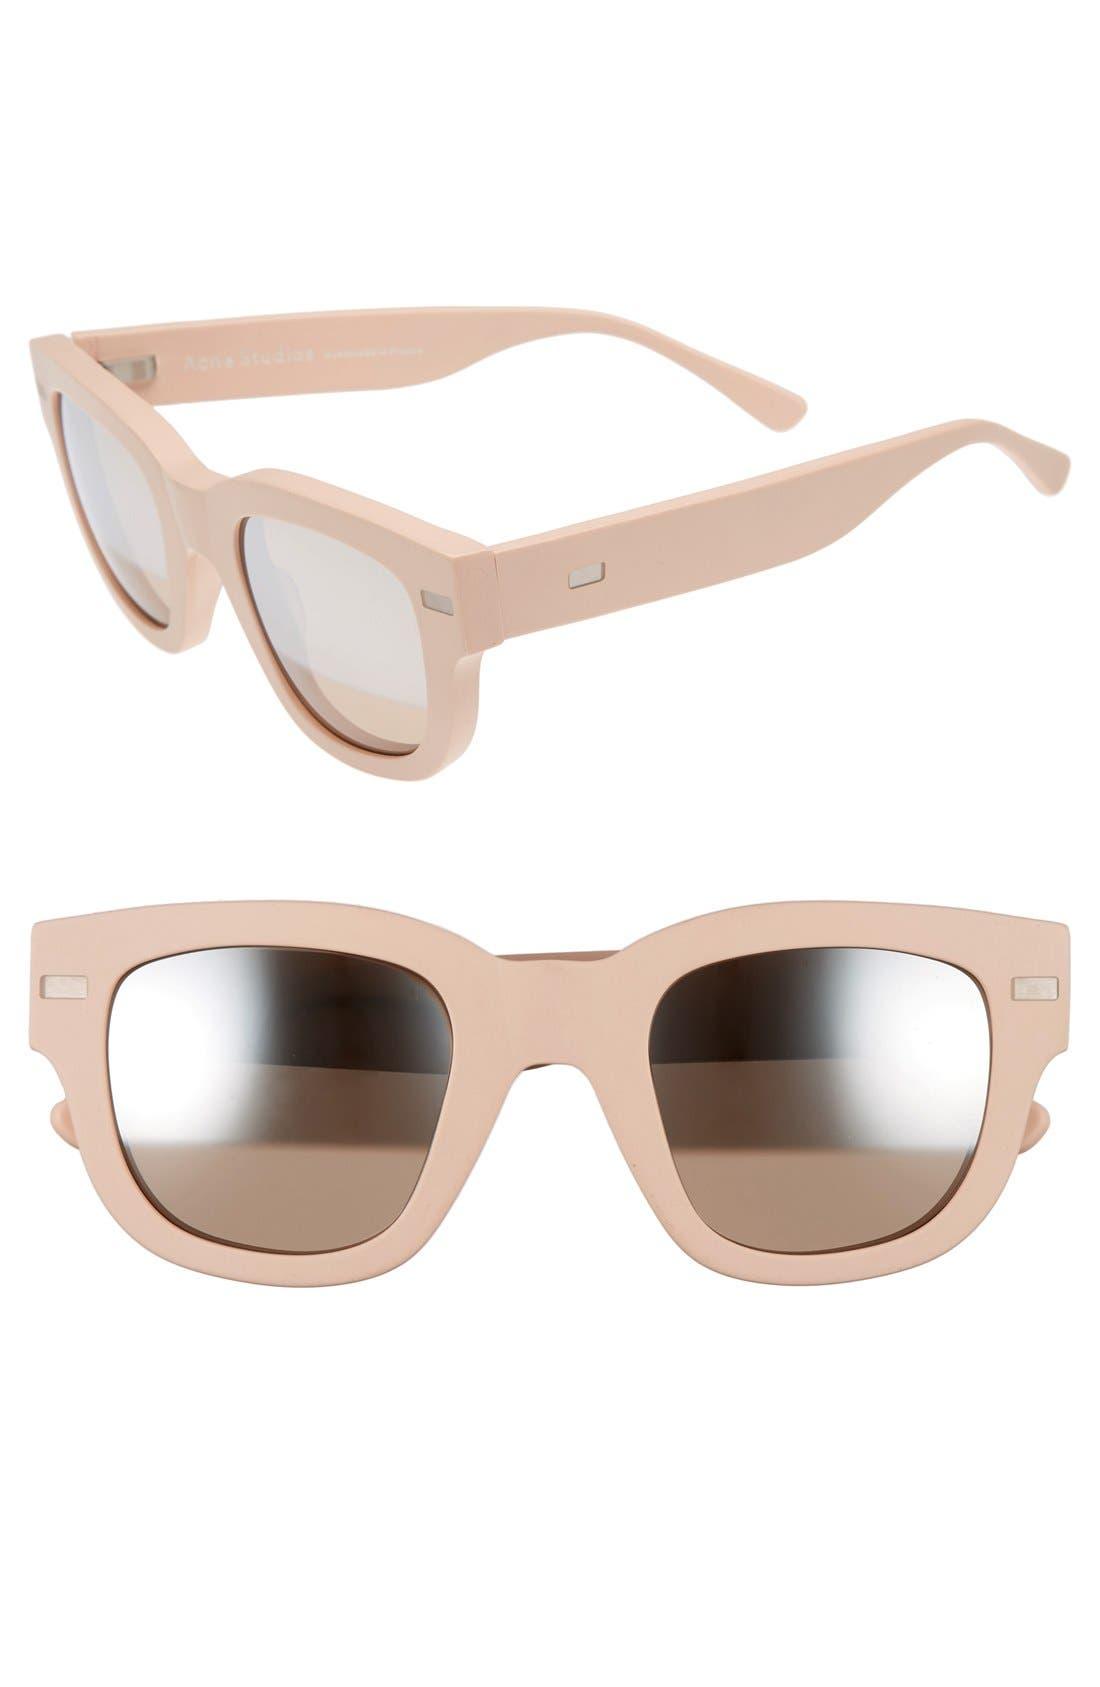 Main Image - ACNE Studios 47mm Sunglasses